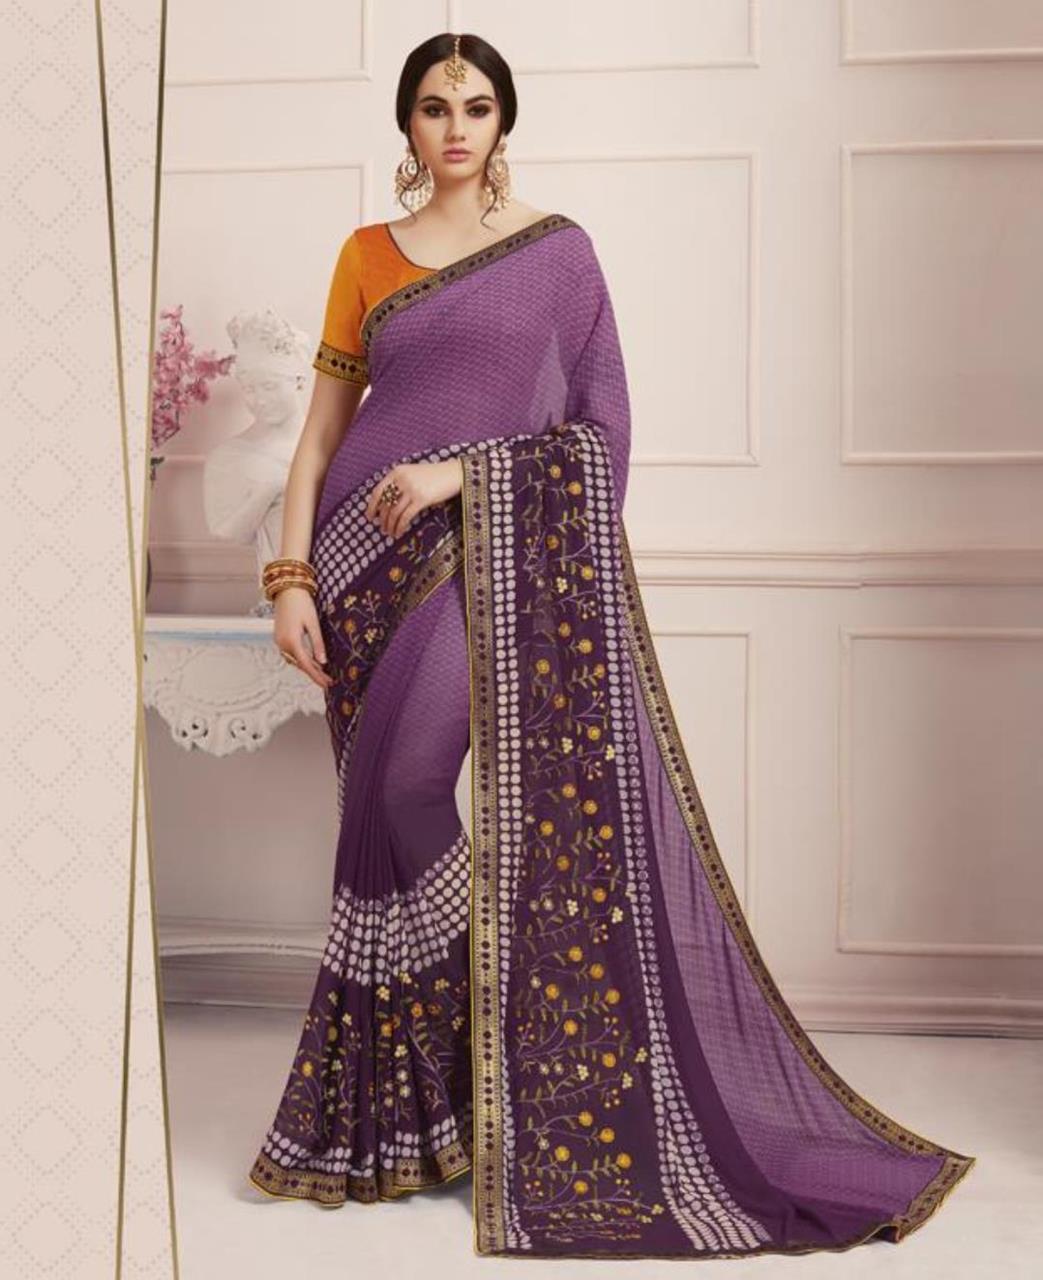 Printed Georgette Saree (Sari) in Purple